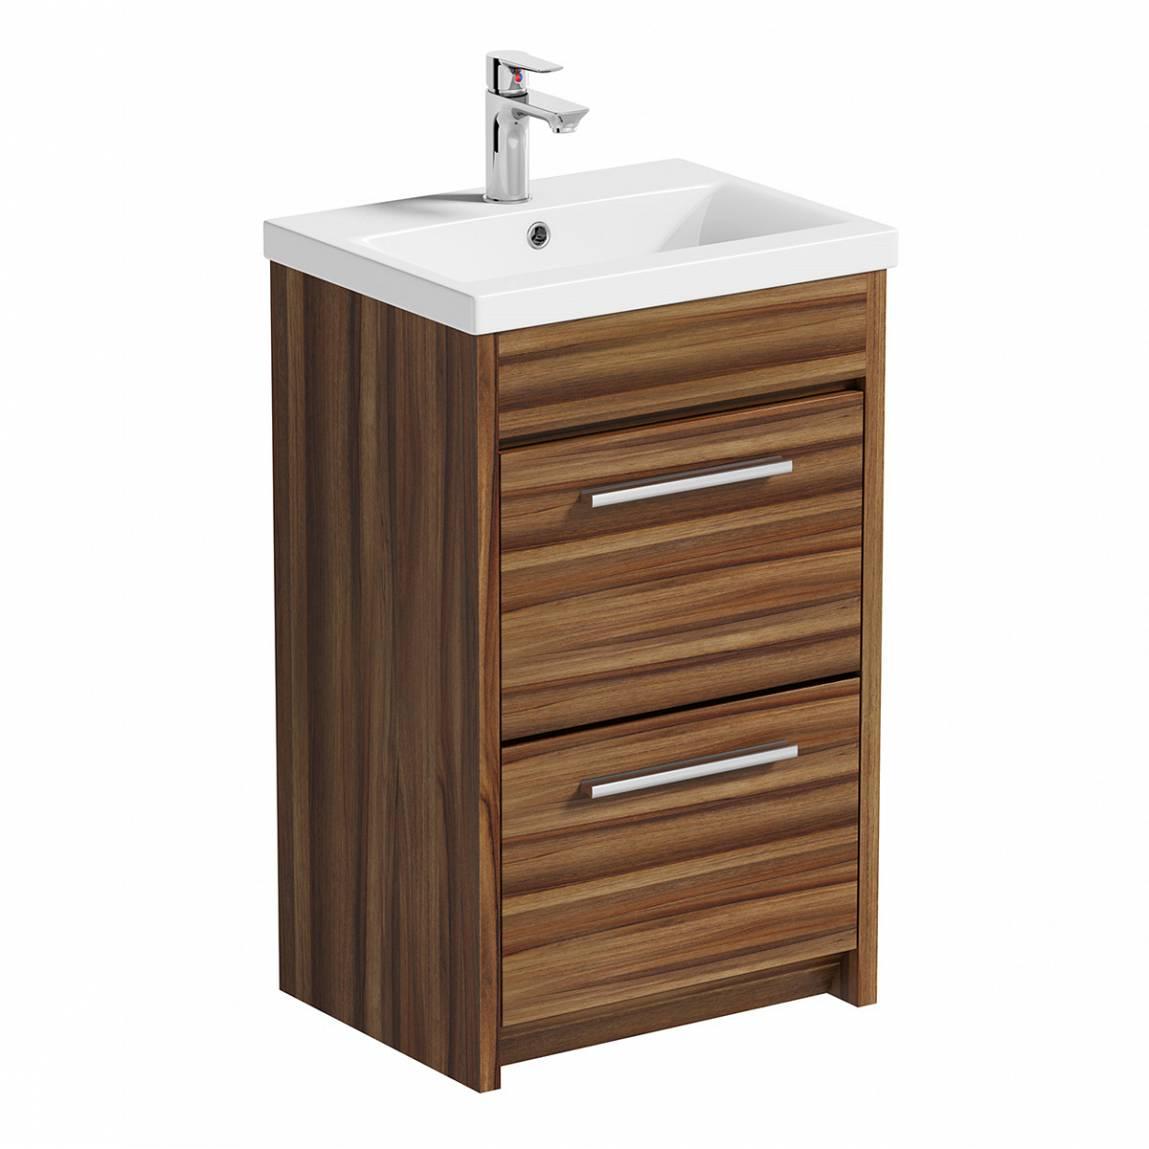 Image of Smart Walnut Floor Mounted 500 Drawer Unit & Basin